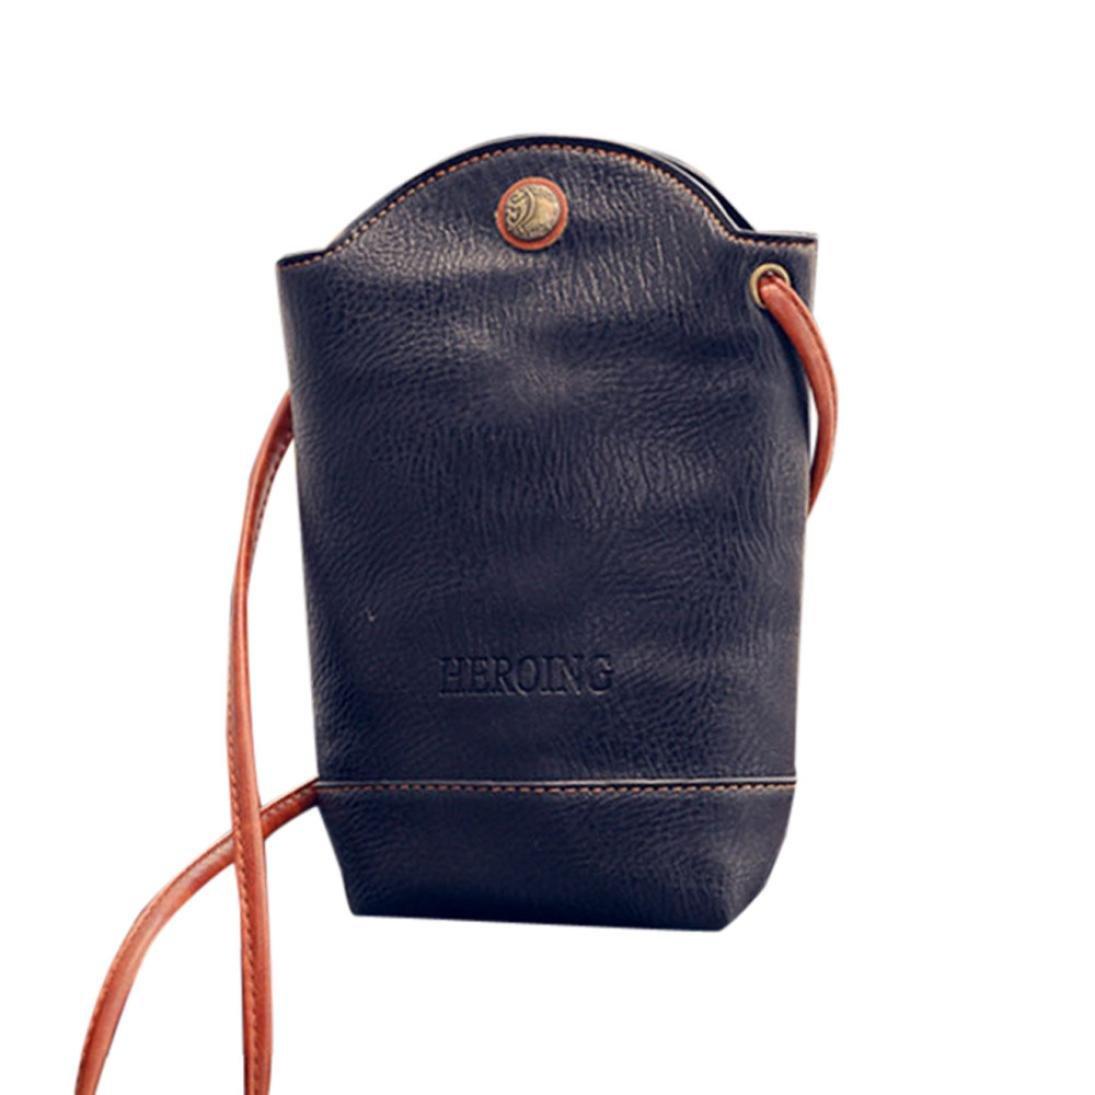 Clearance Deals Women Handbag Shoulder Bag, TOOPOOT Lady Small Body Bags Tote Shoulder Messenger Bag (Black) by TOOPOOT (Image #2)